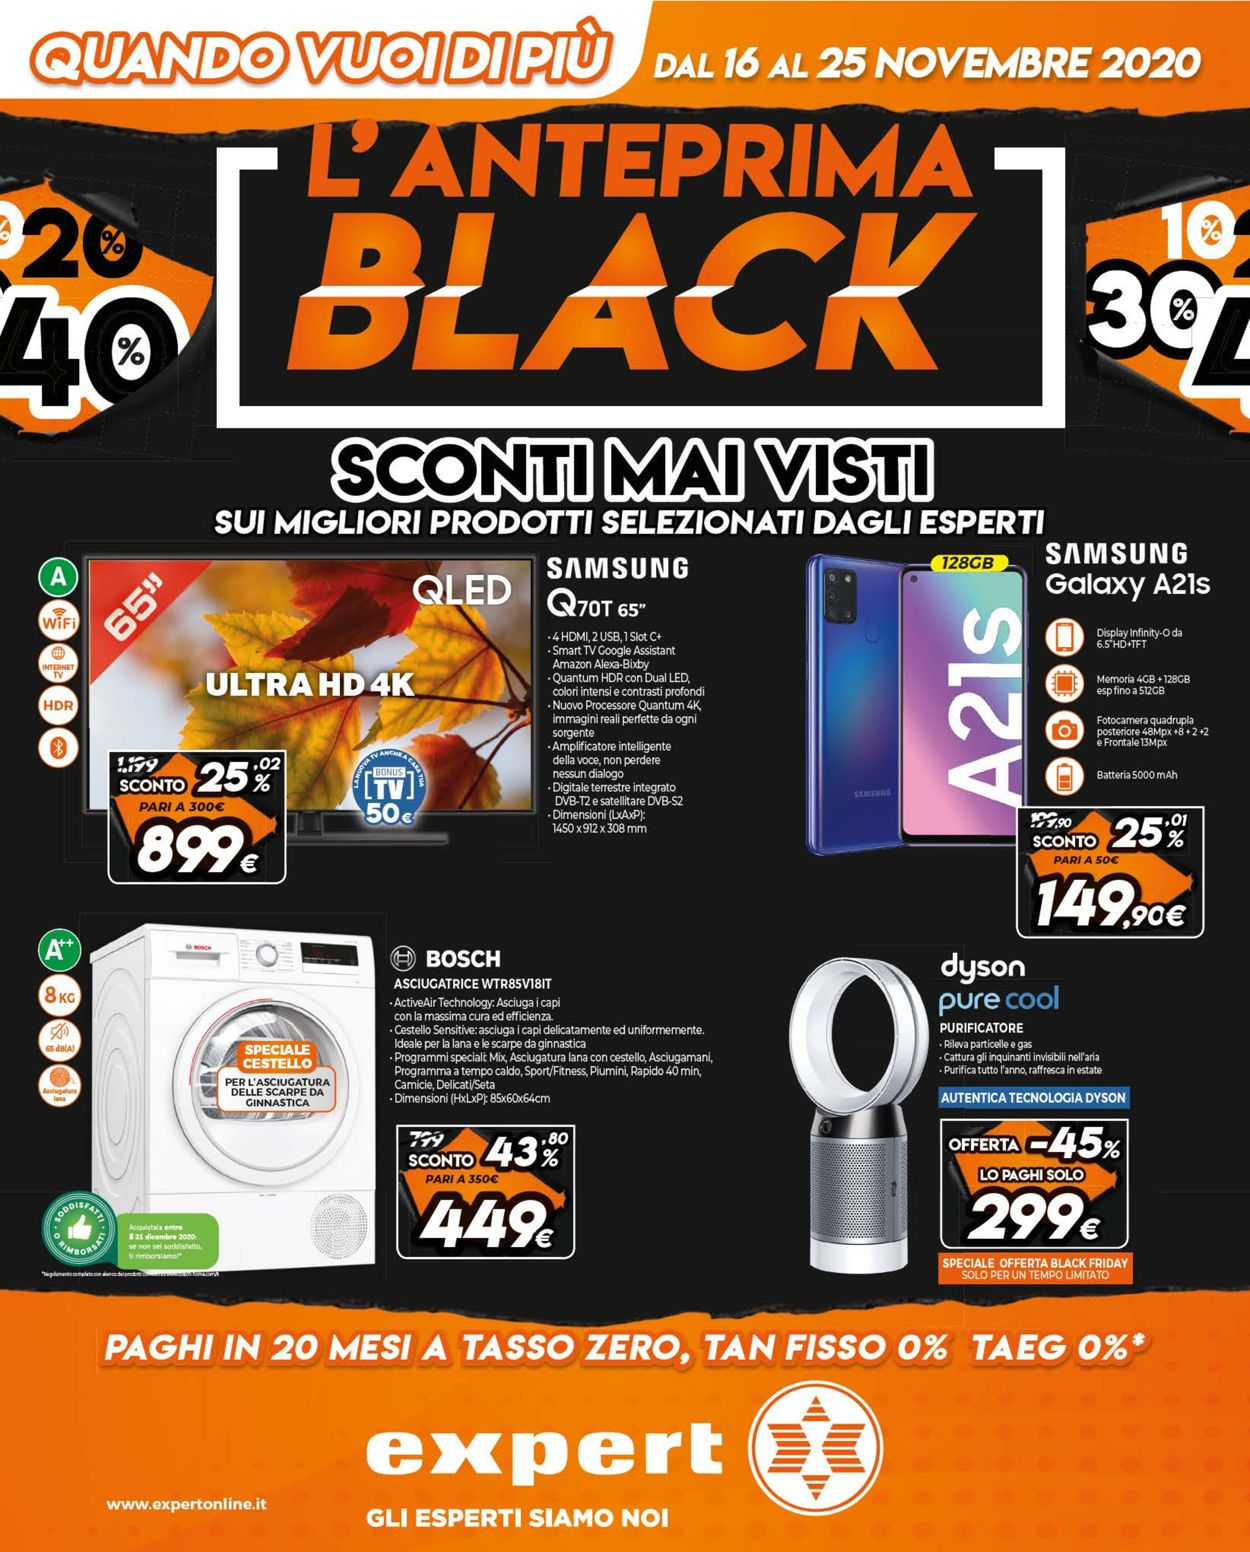 Volantino Expert - Black Friday 2020 - Offerte 16/11-25/11/2020